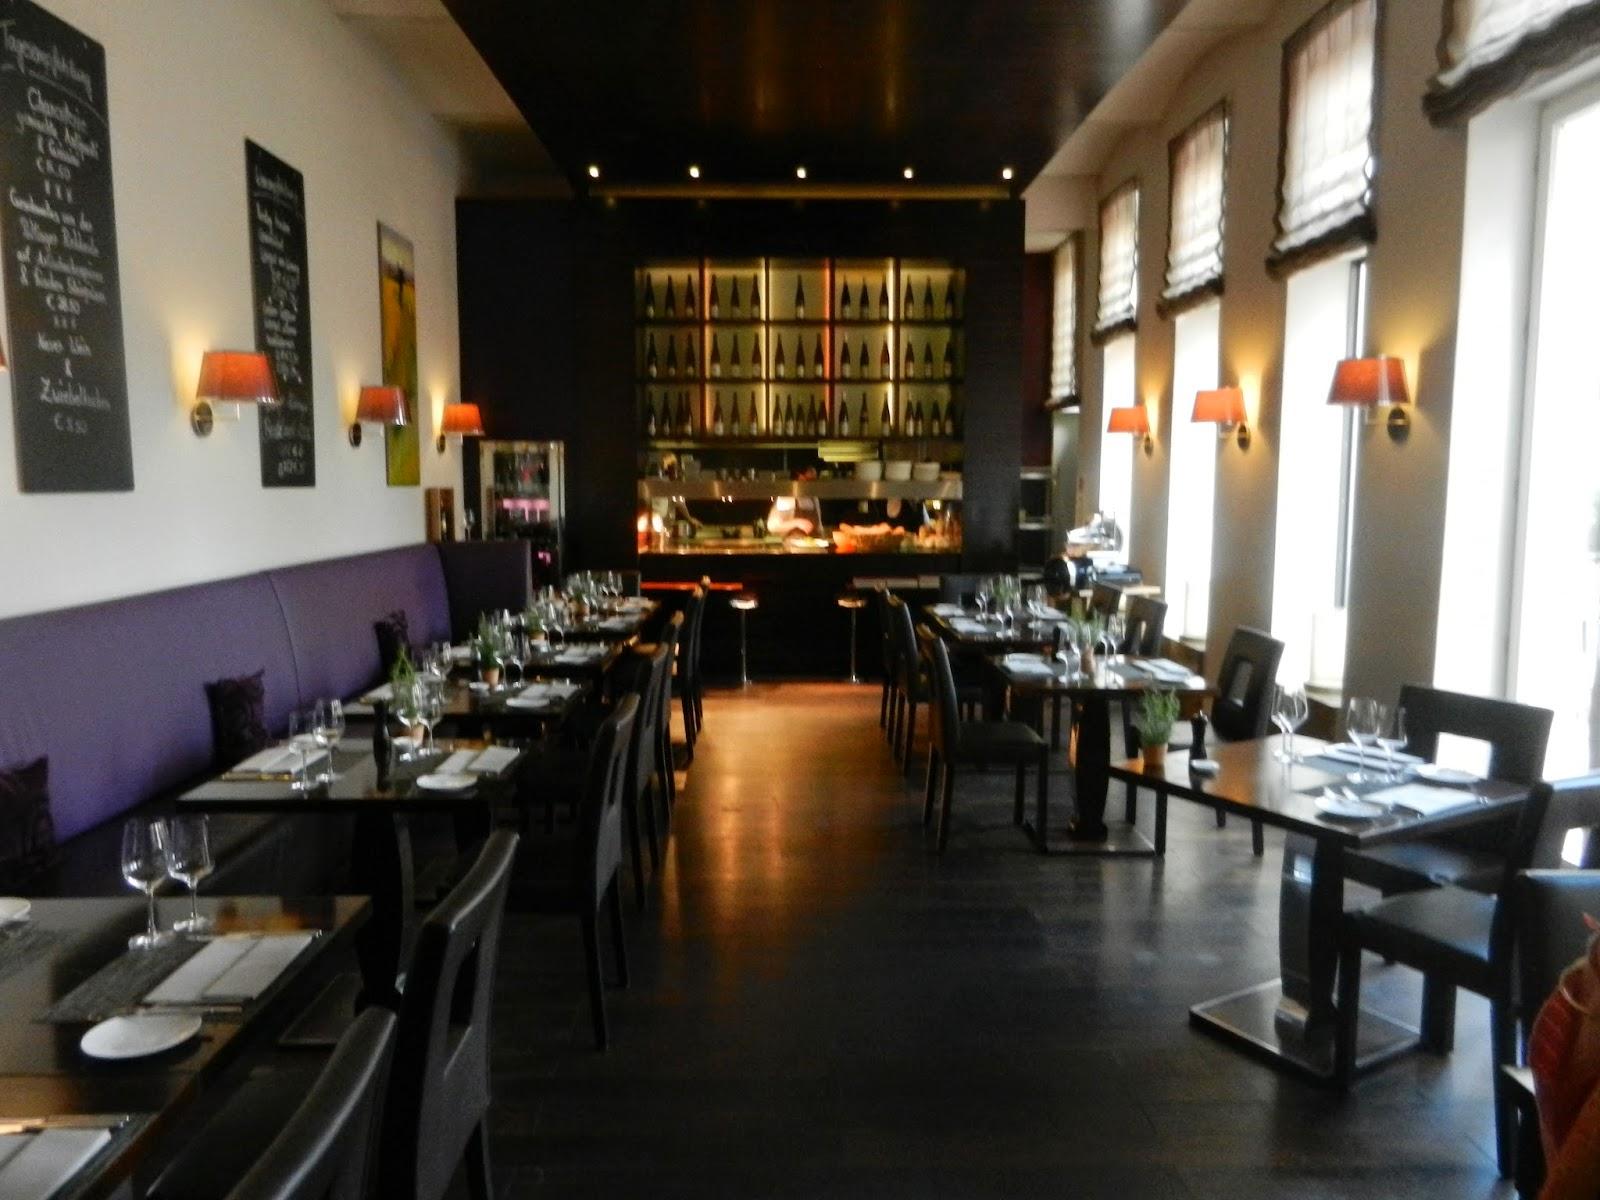 Cafe de Paris Mushrooms Salad And Café de Paris